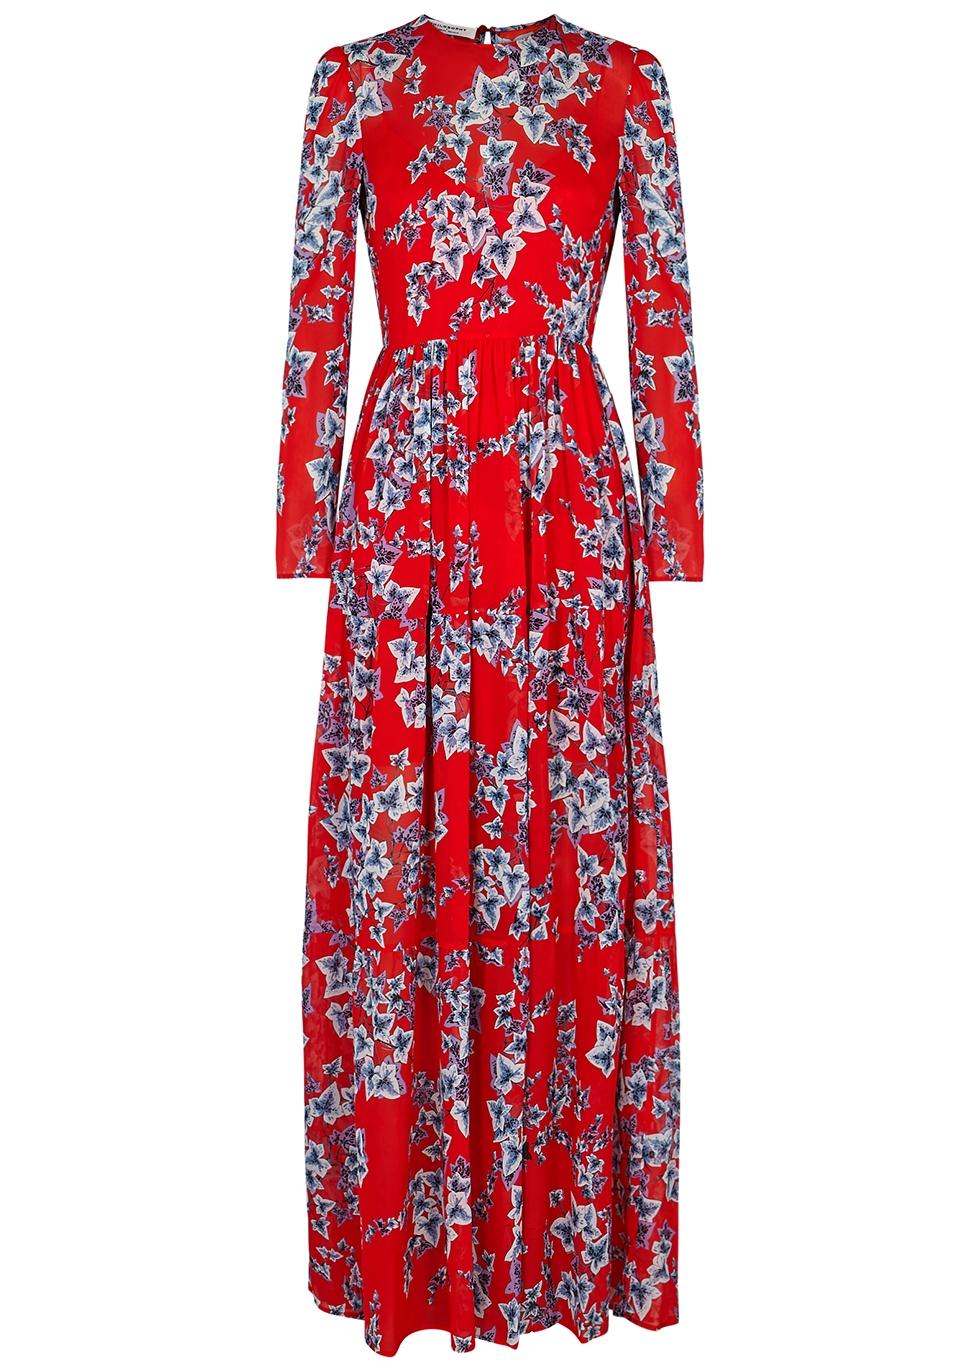 dec57d79f2 New In - Women's Designer Clothing - Harvey Nichols